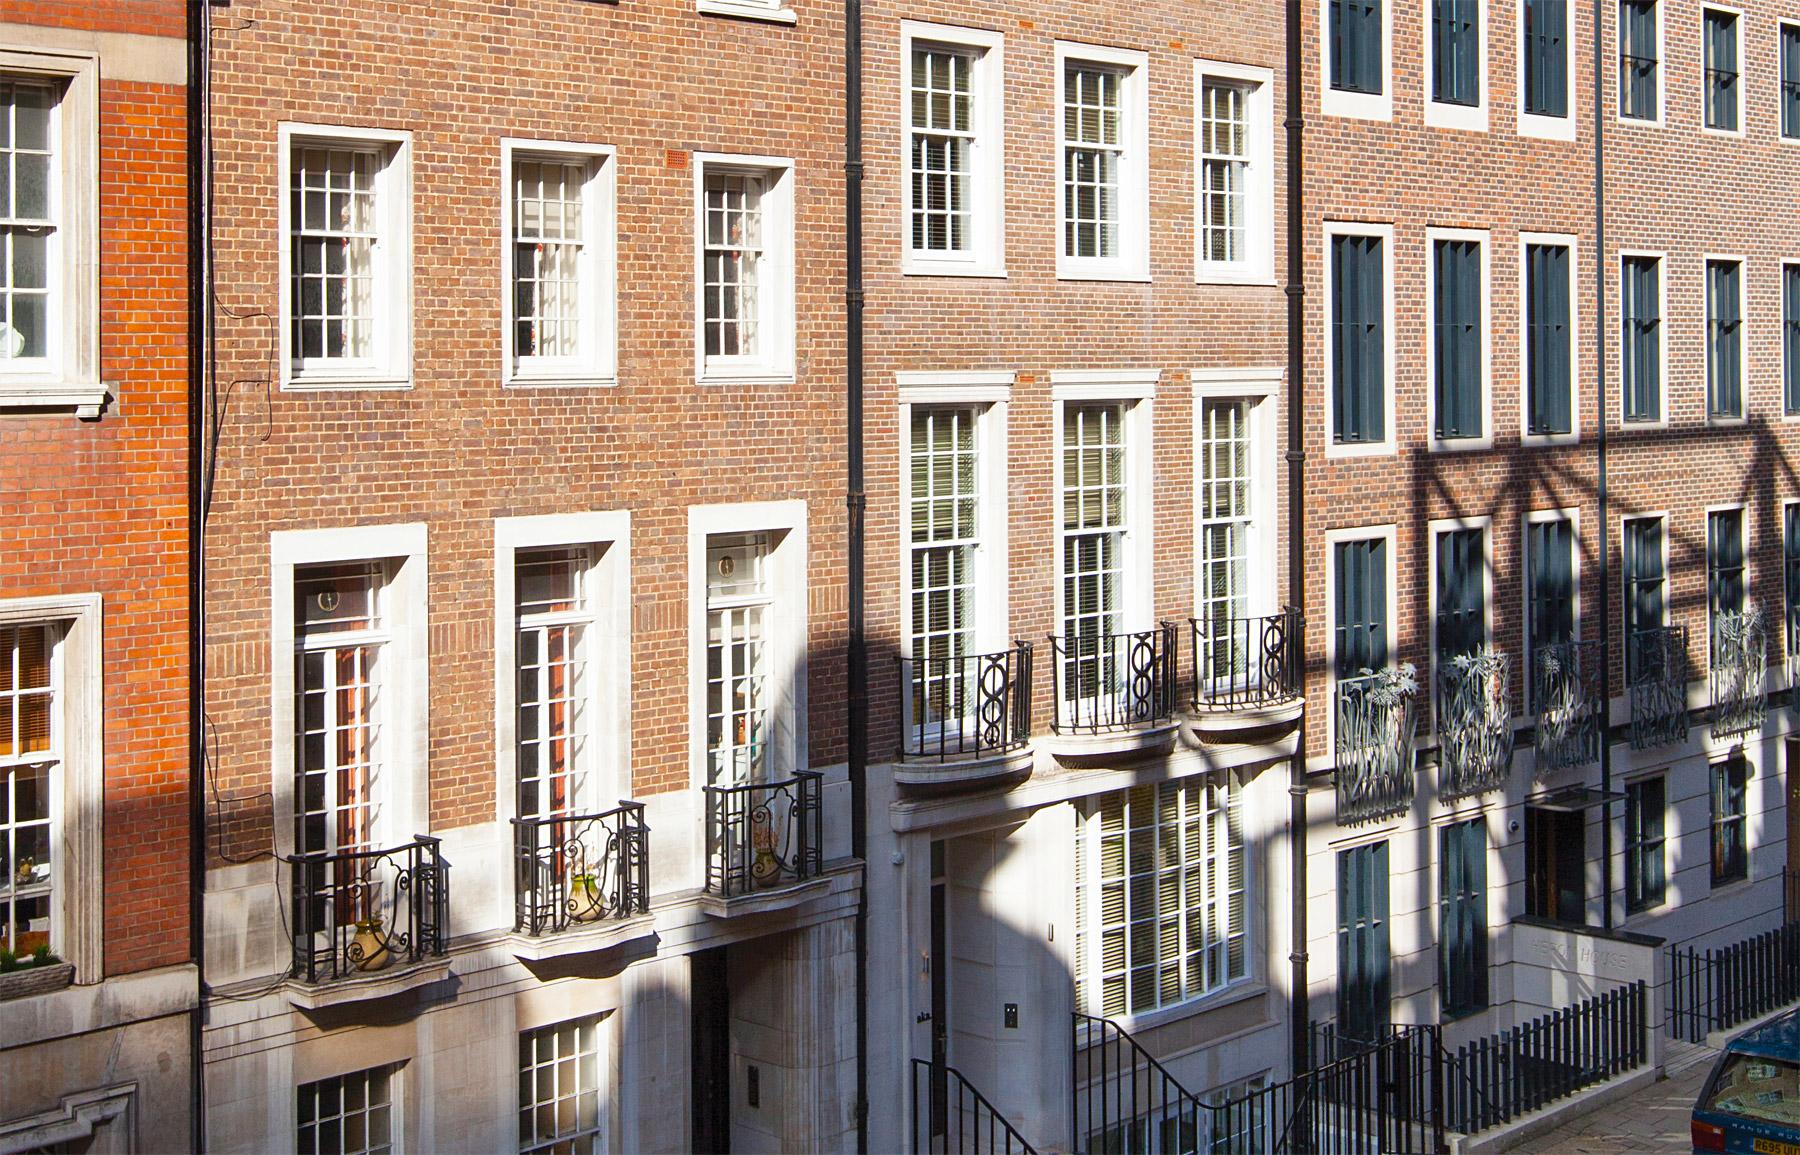 Residing In Luxury At London's AKA Marylebone